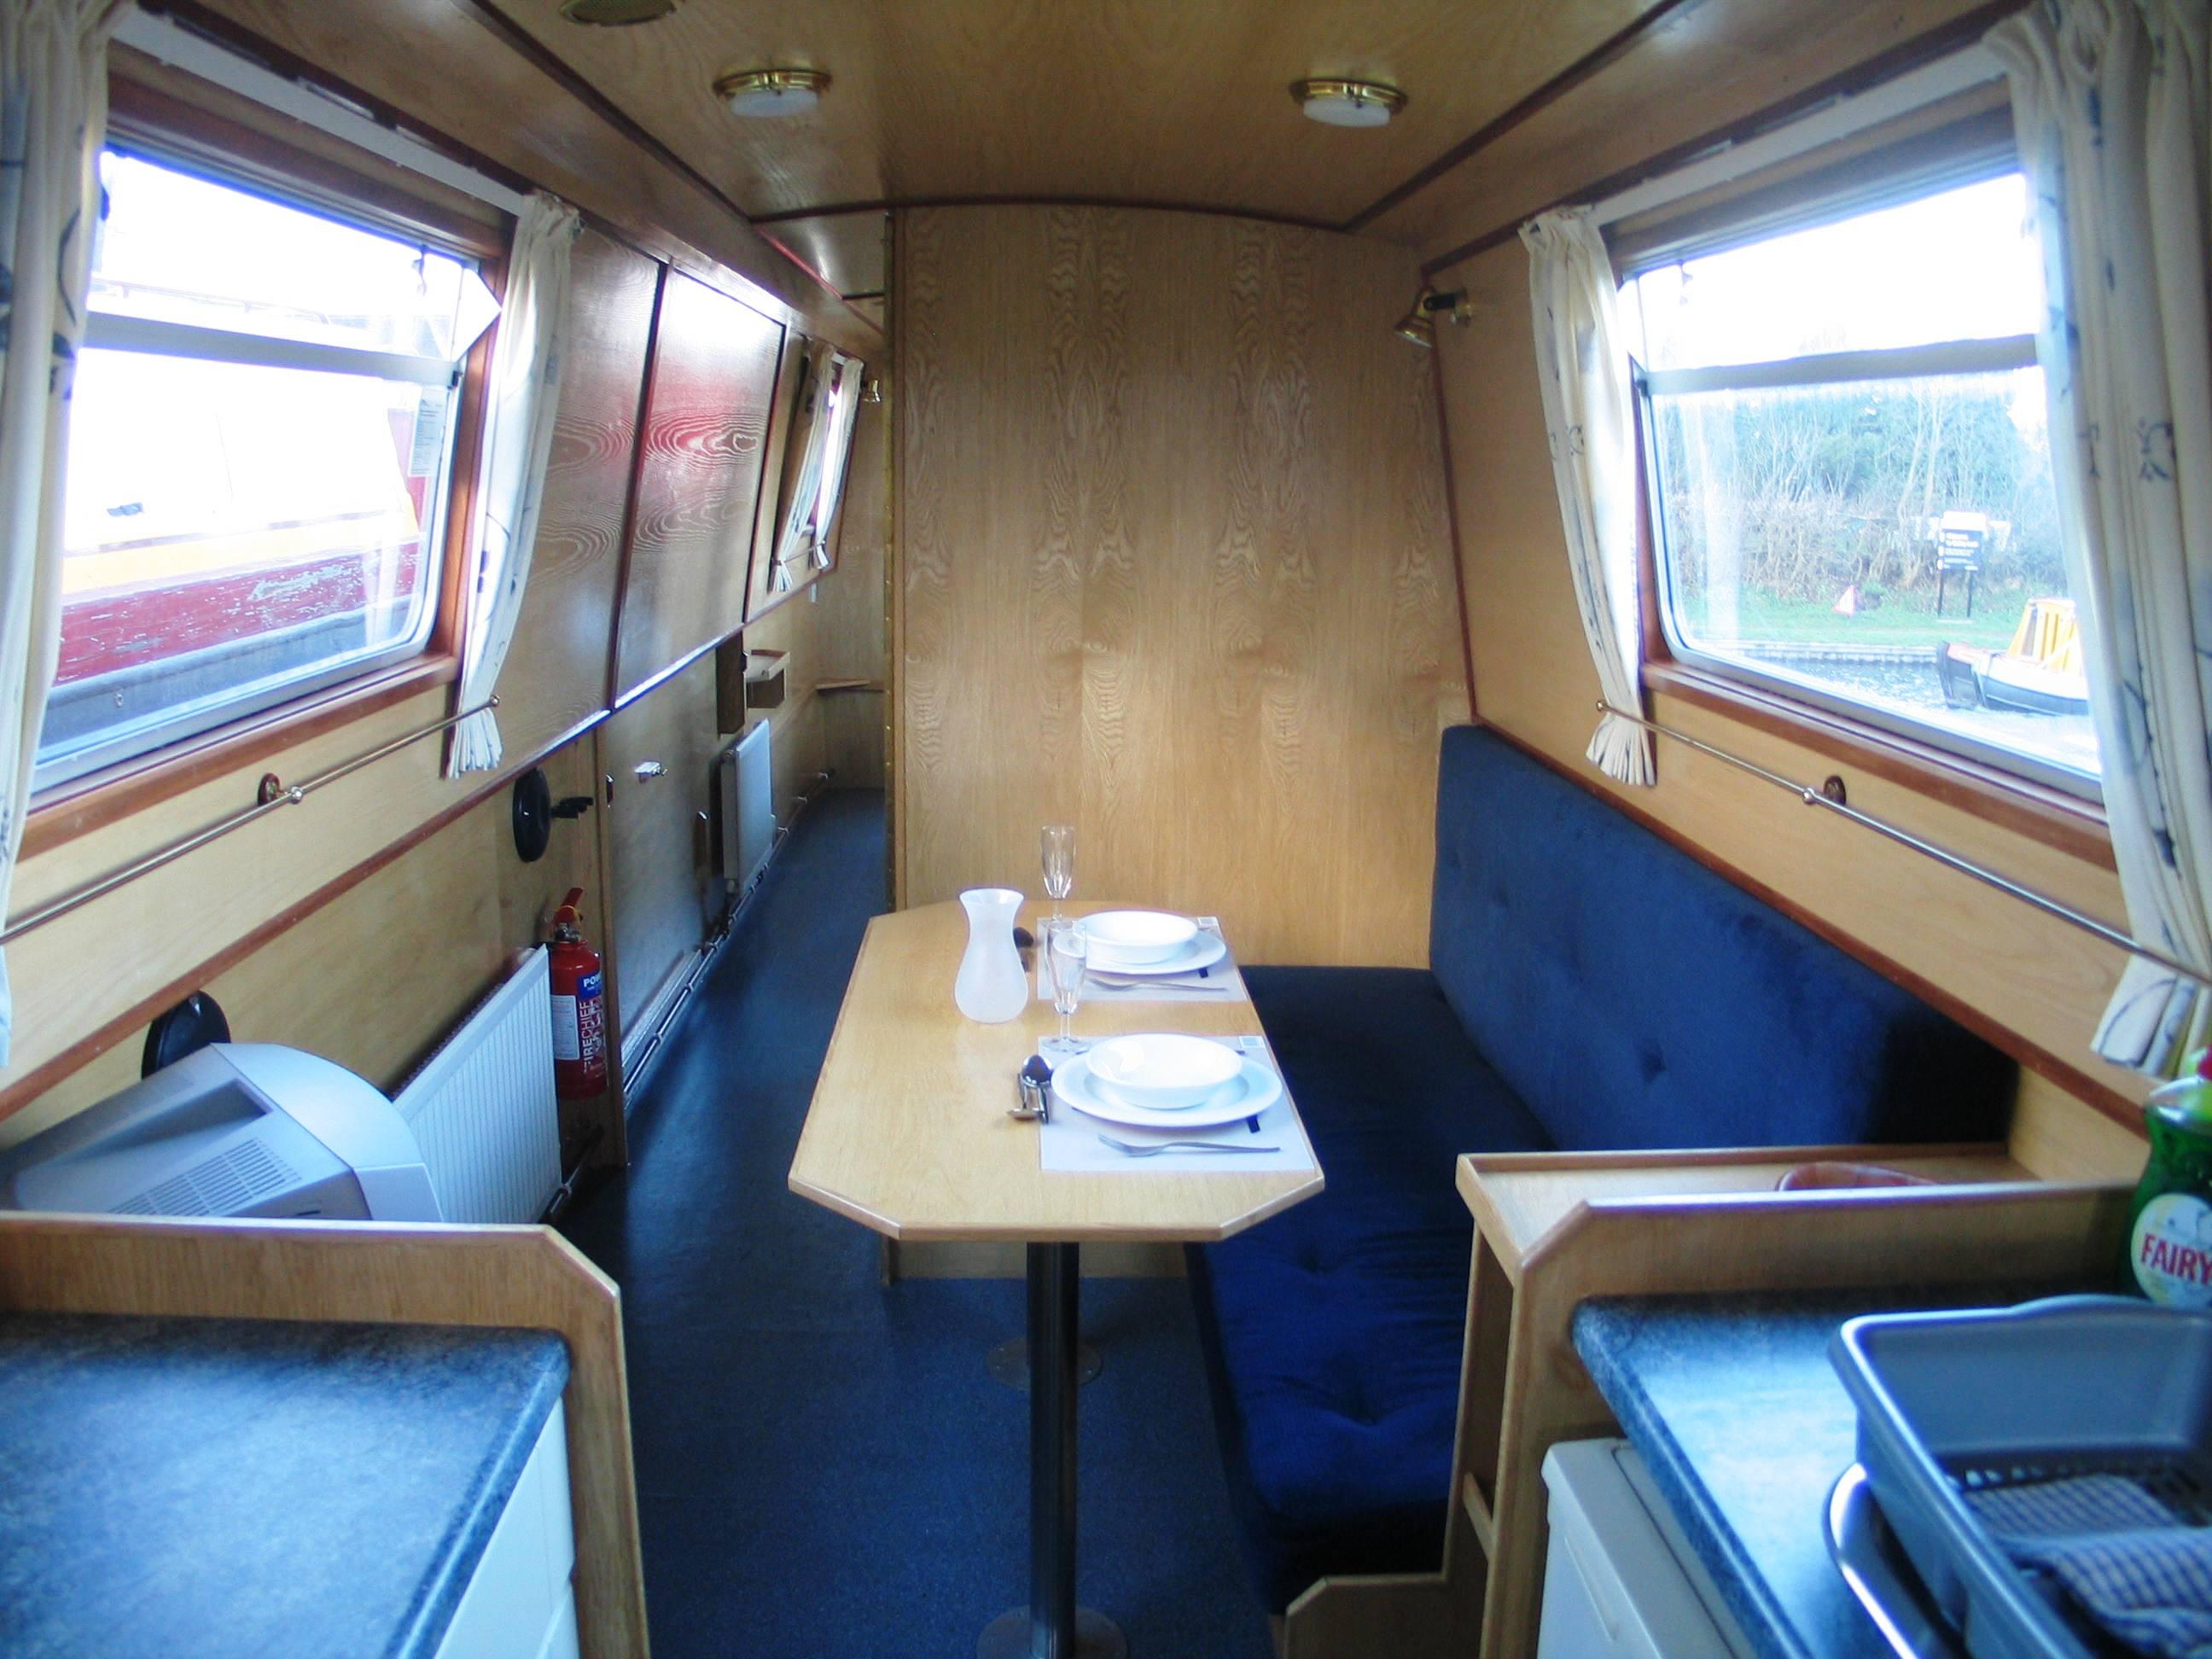 The Nene class canal boat